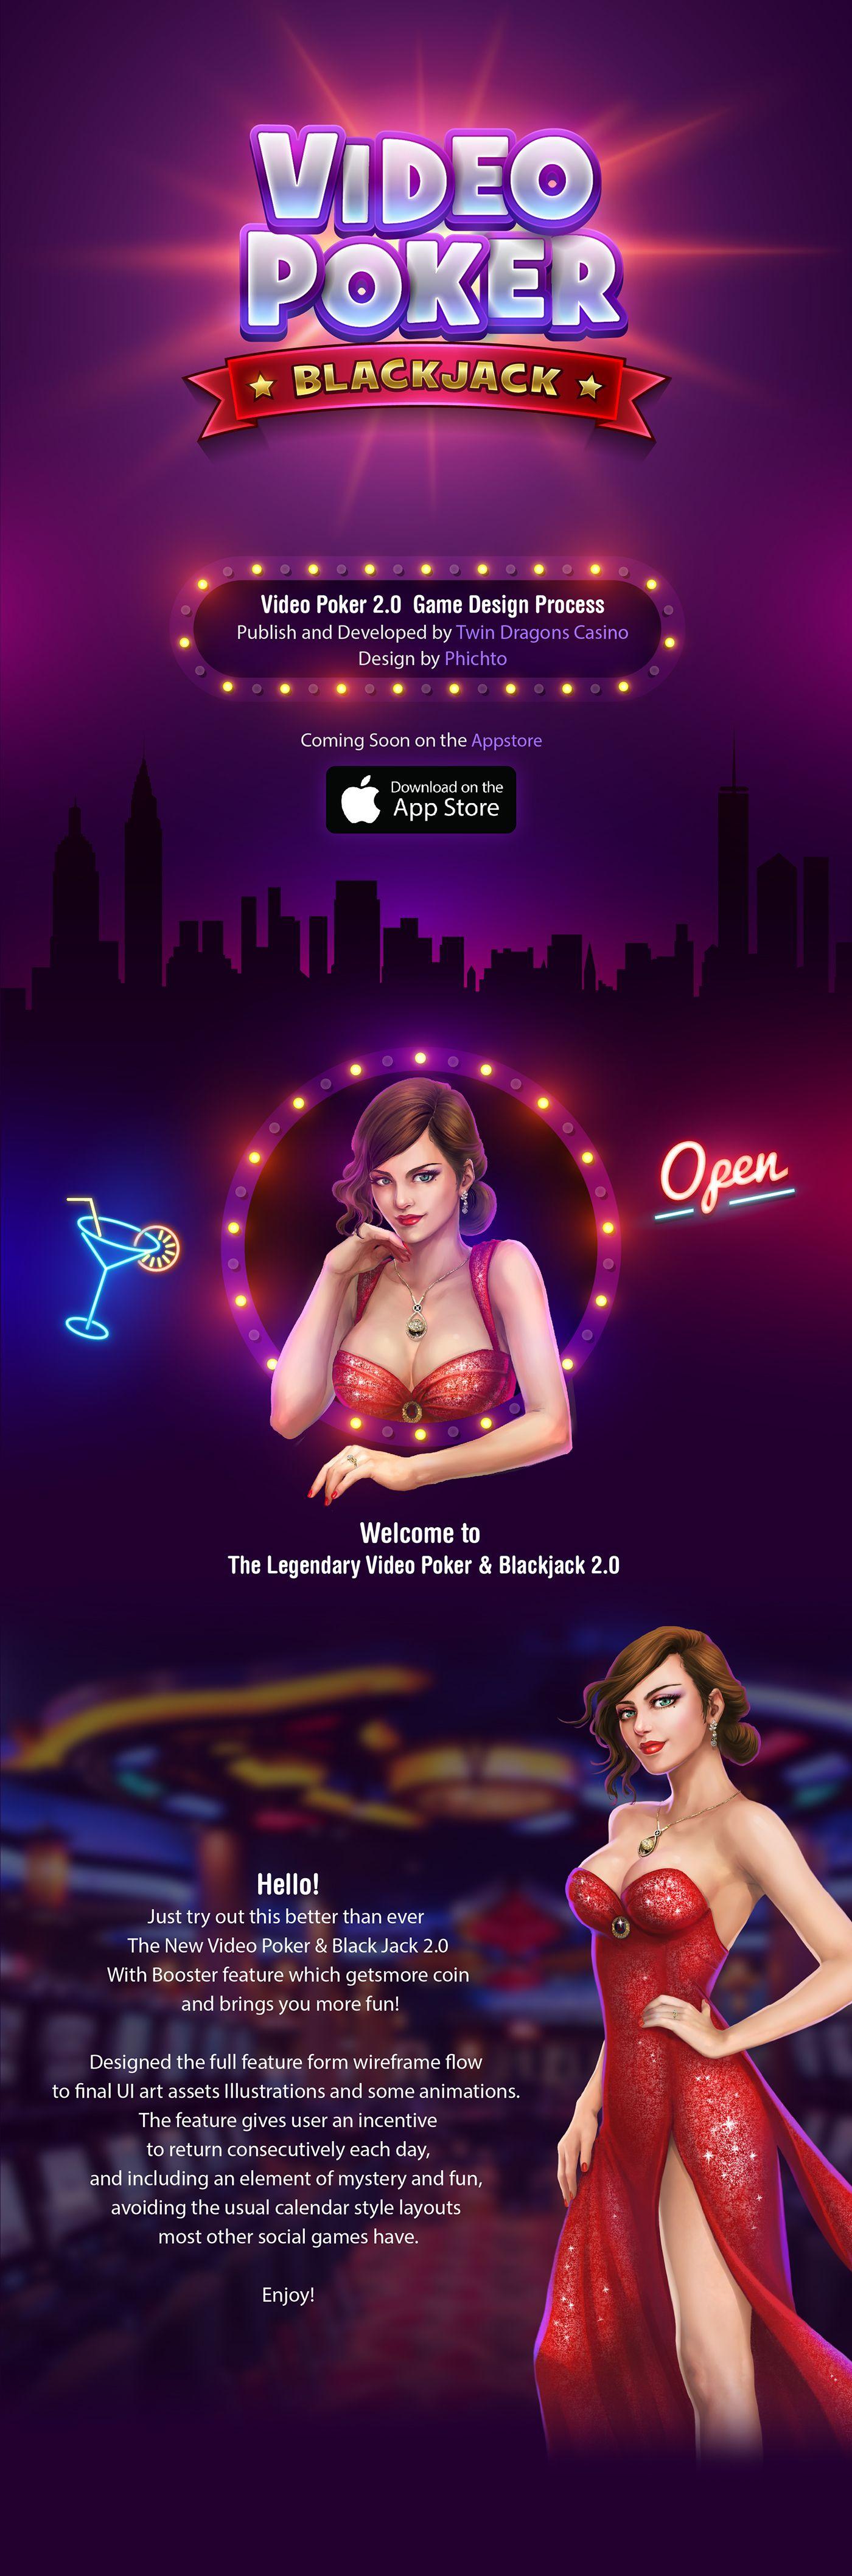 Online Casino Promotions